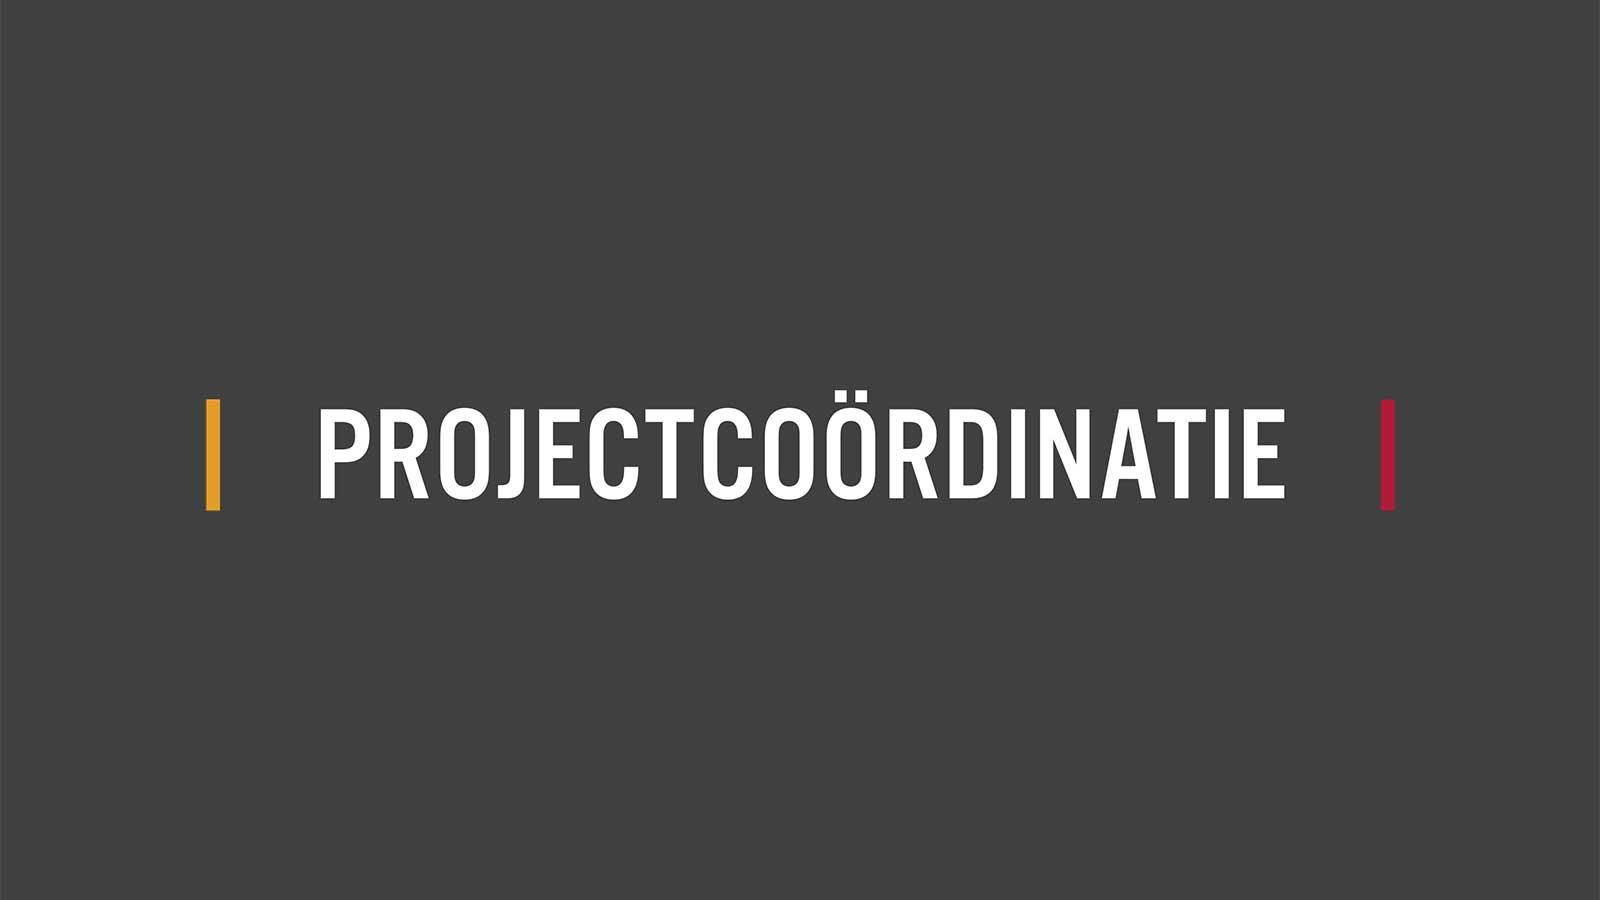 Bouwgoed - Projectcoördinatie